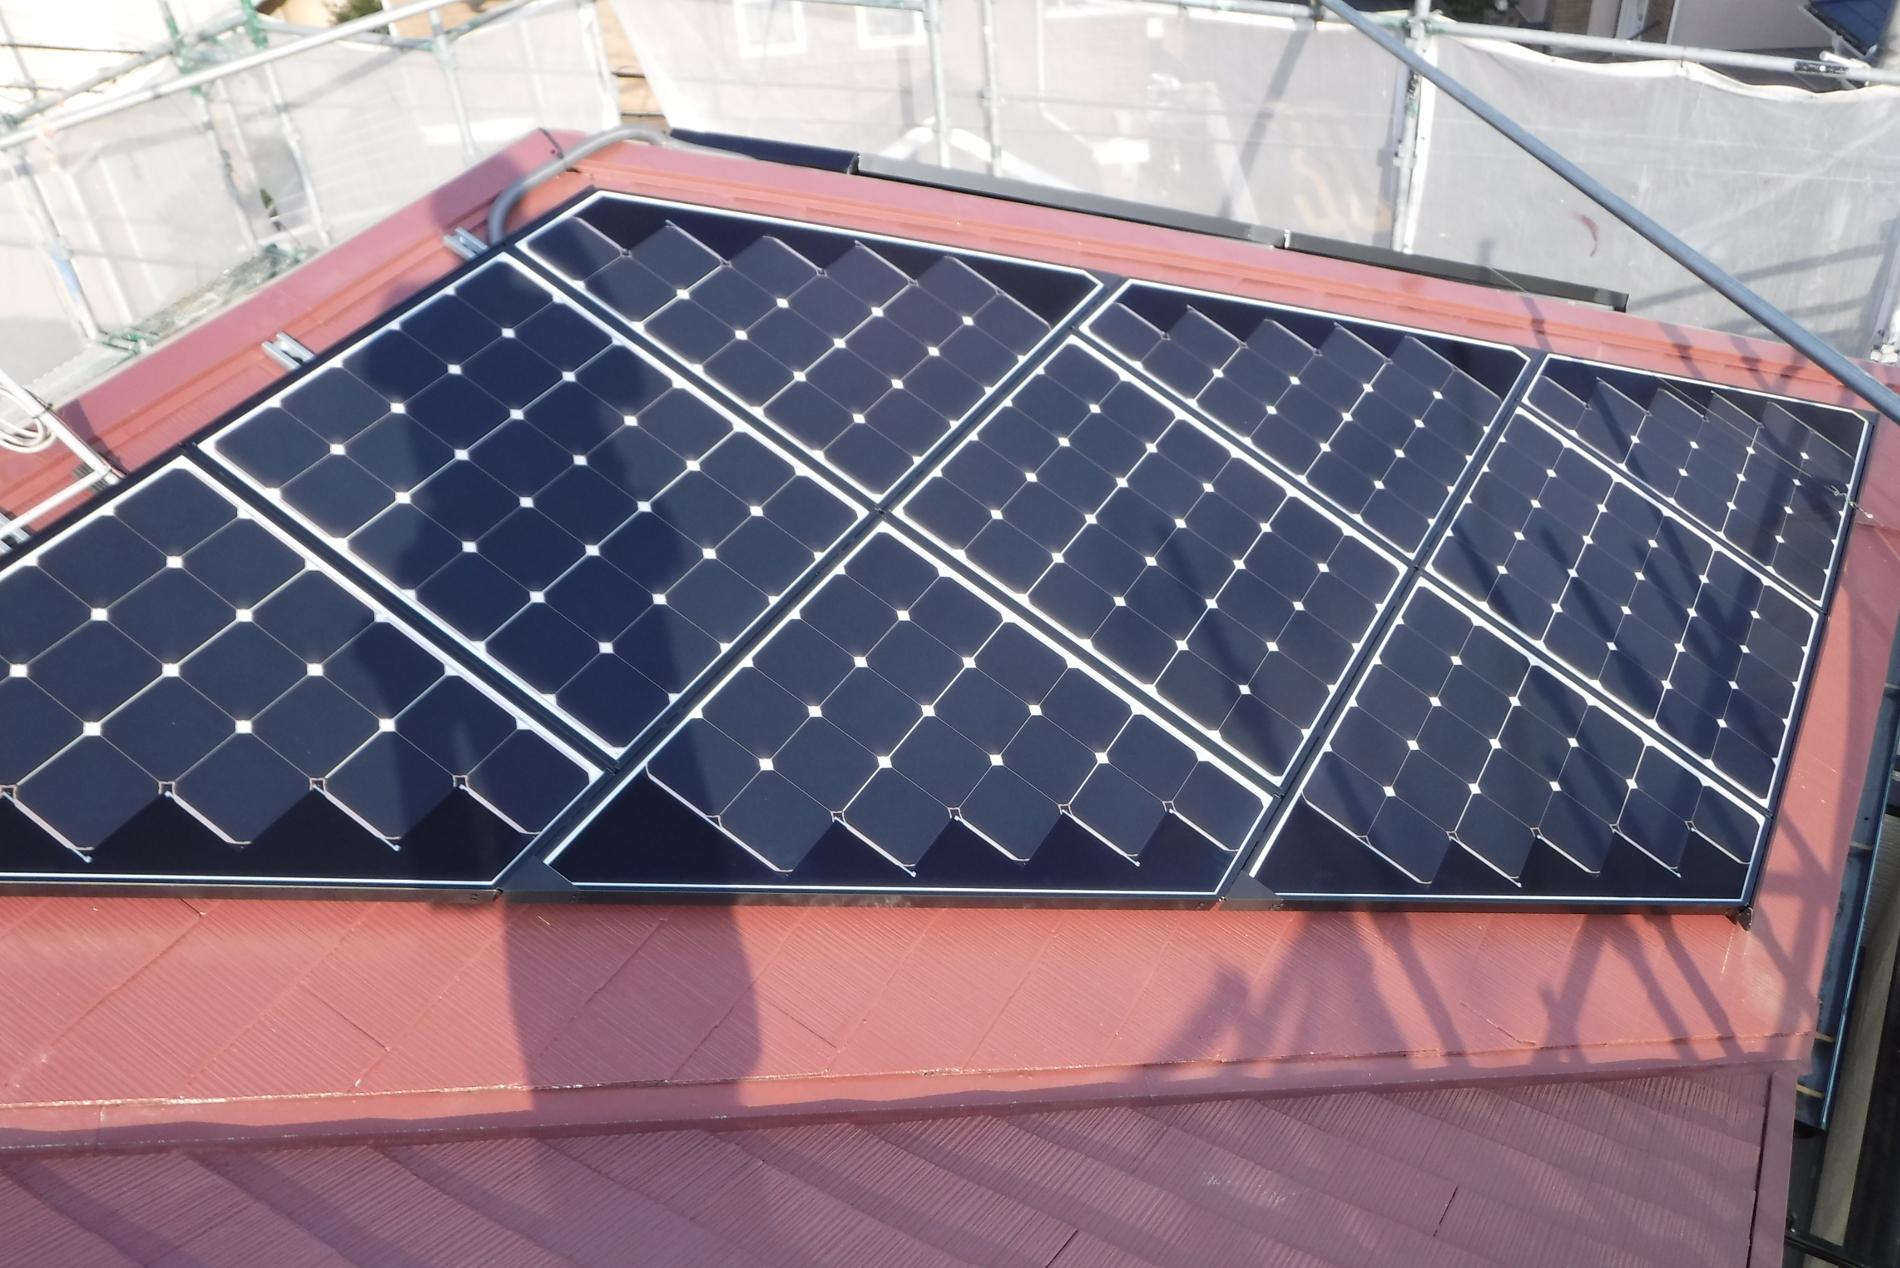 新座市A様太陽光パネル設置完了